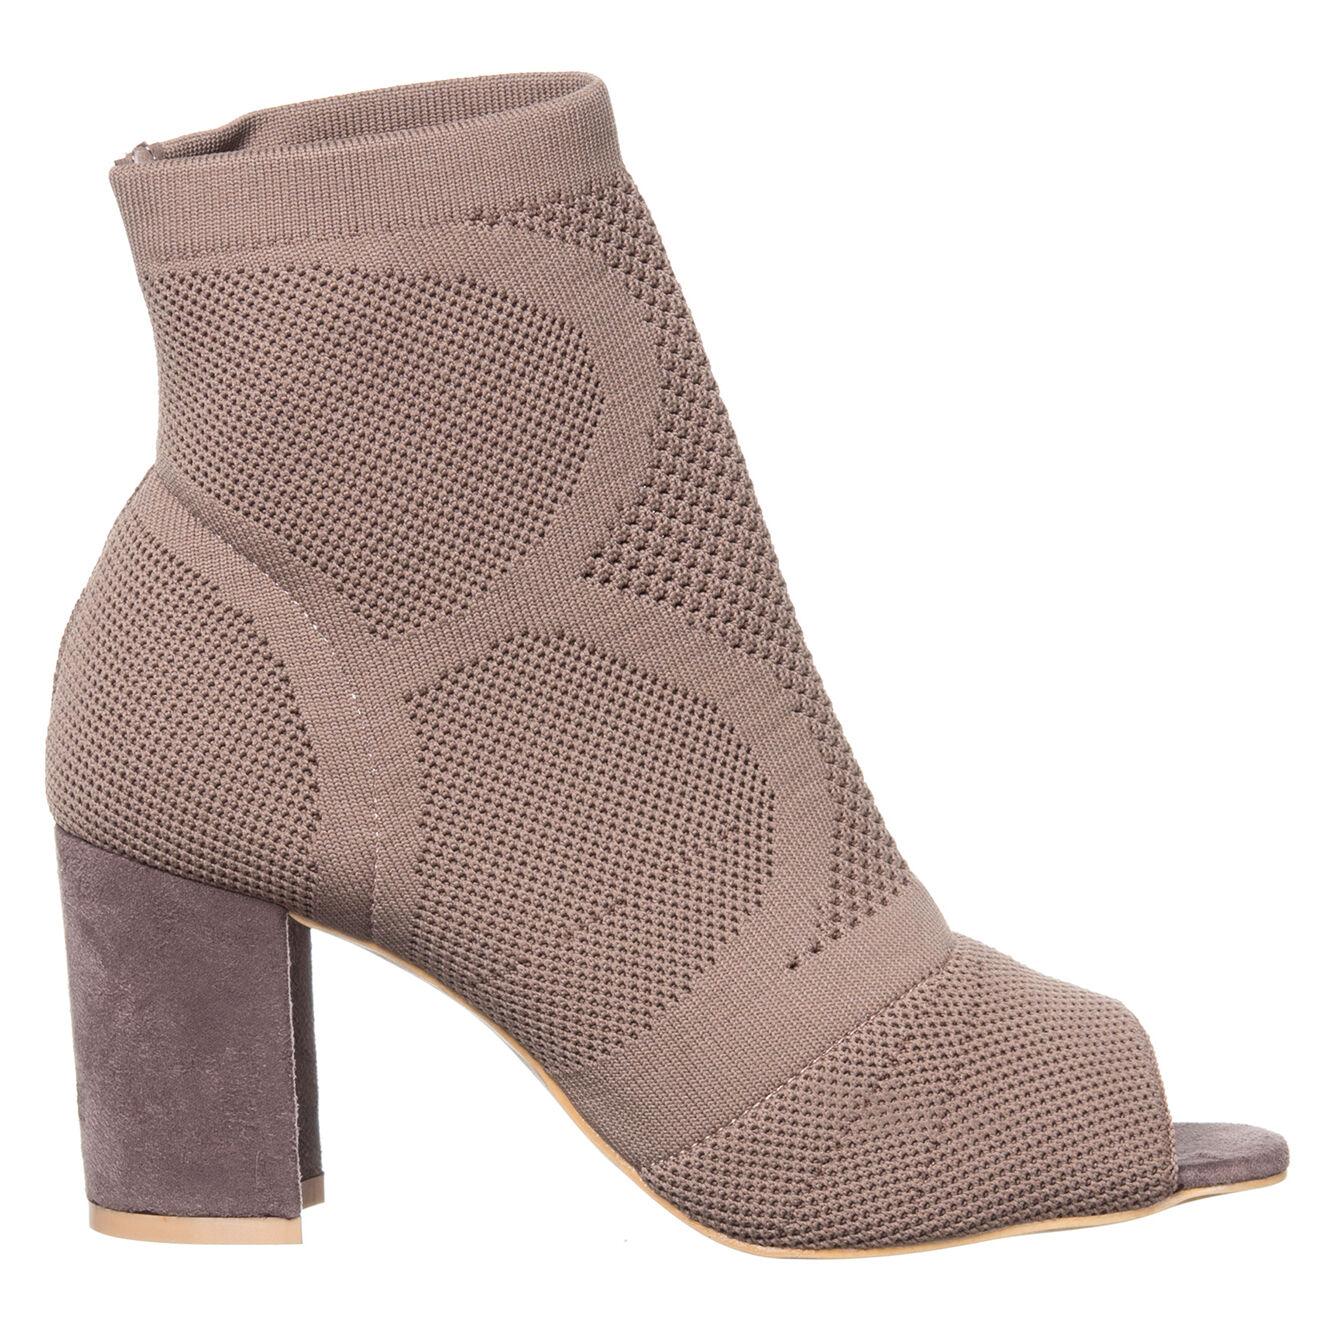 Boots Eleonora taupe - Talon 8 cm